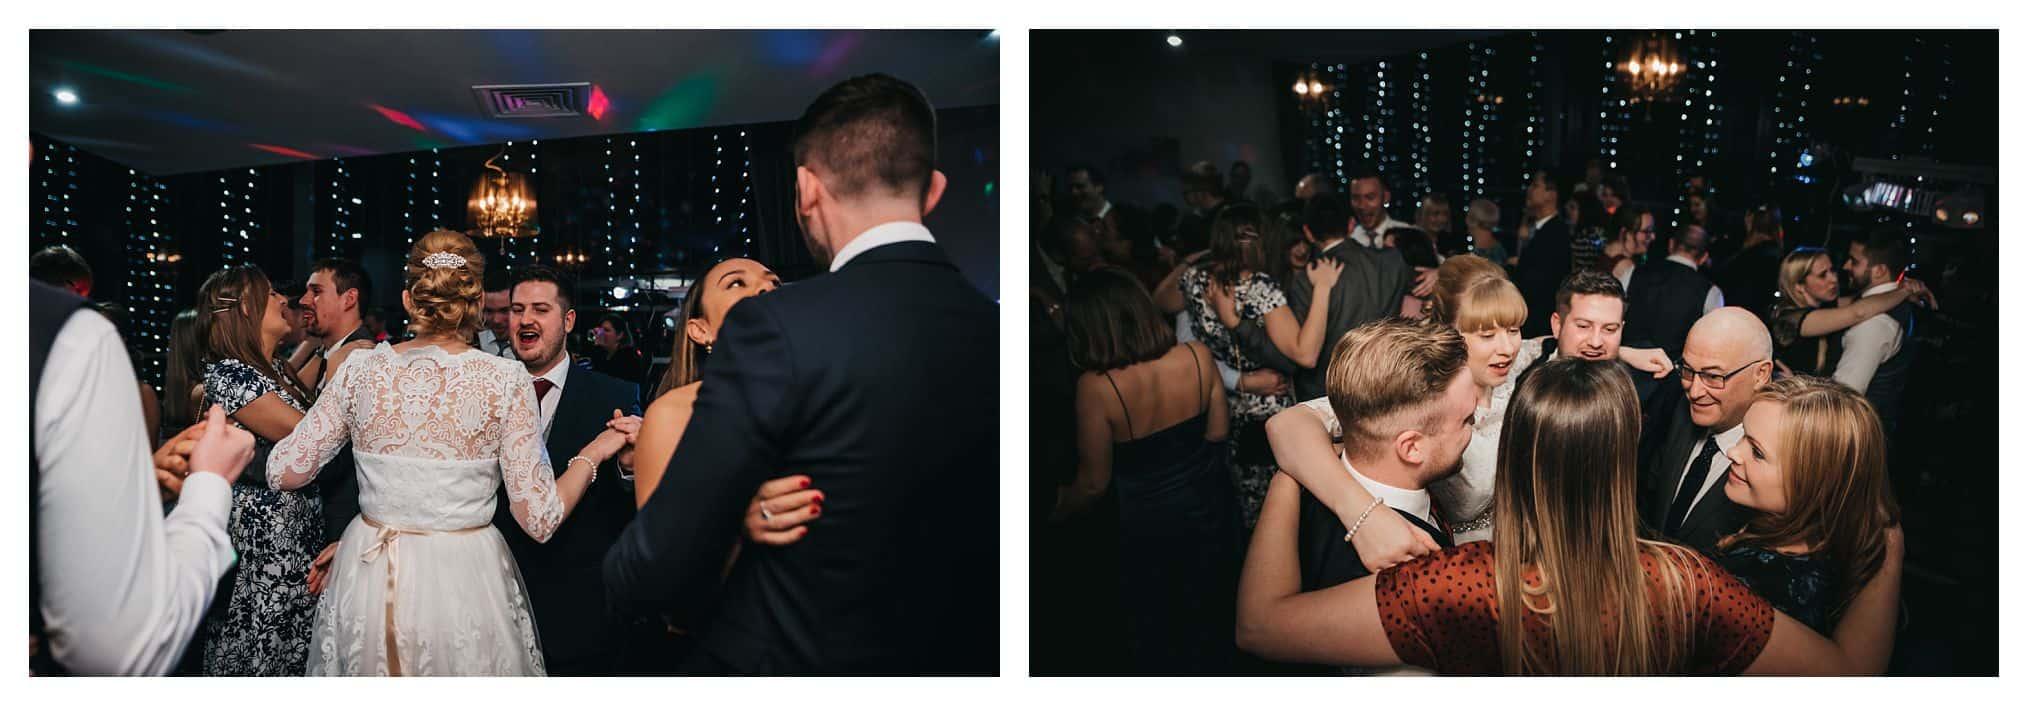 first dance bride and groom dancing